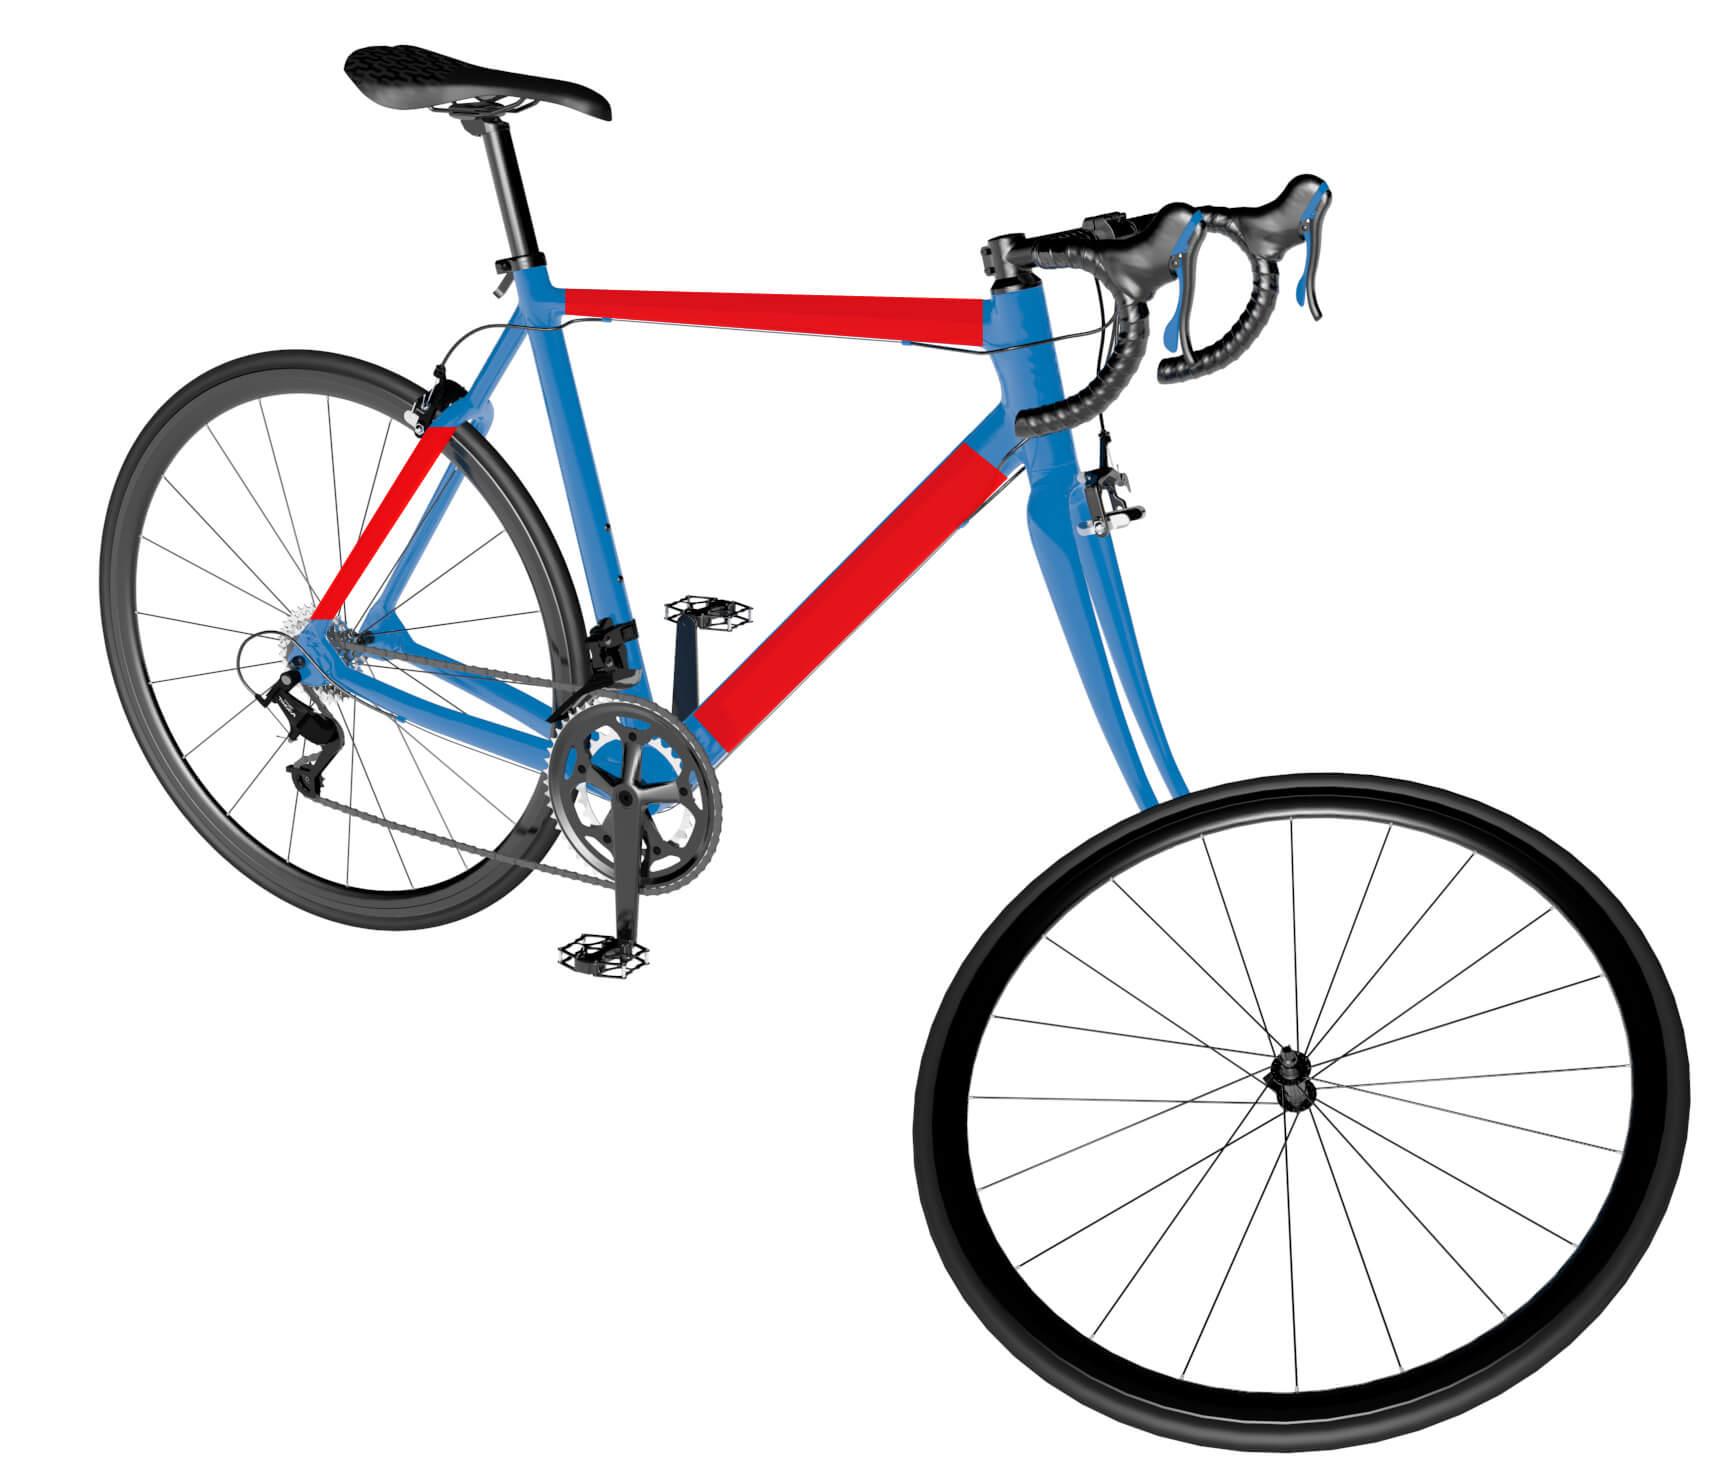 Fahrrad Rohre Folieren